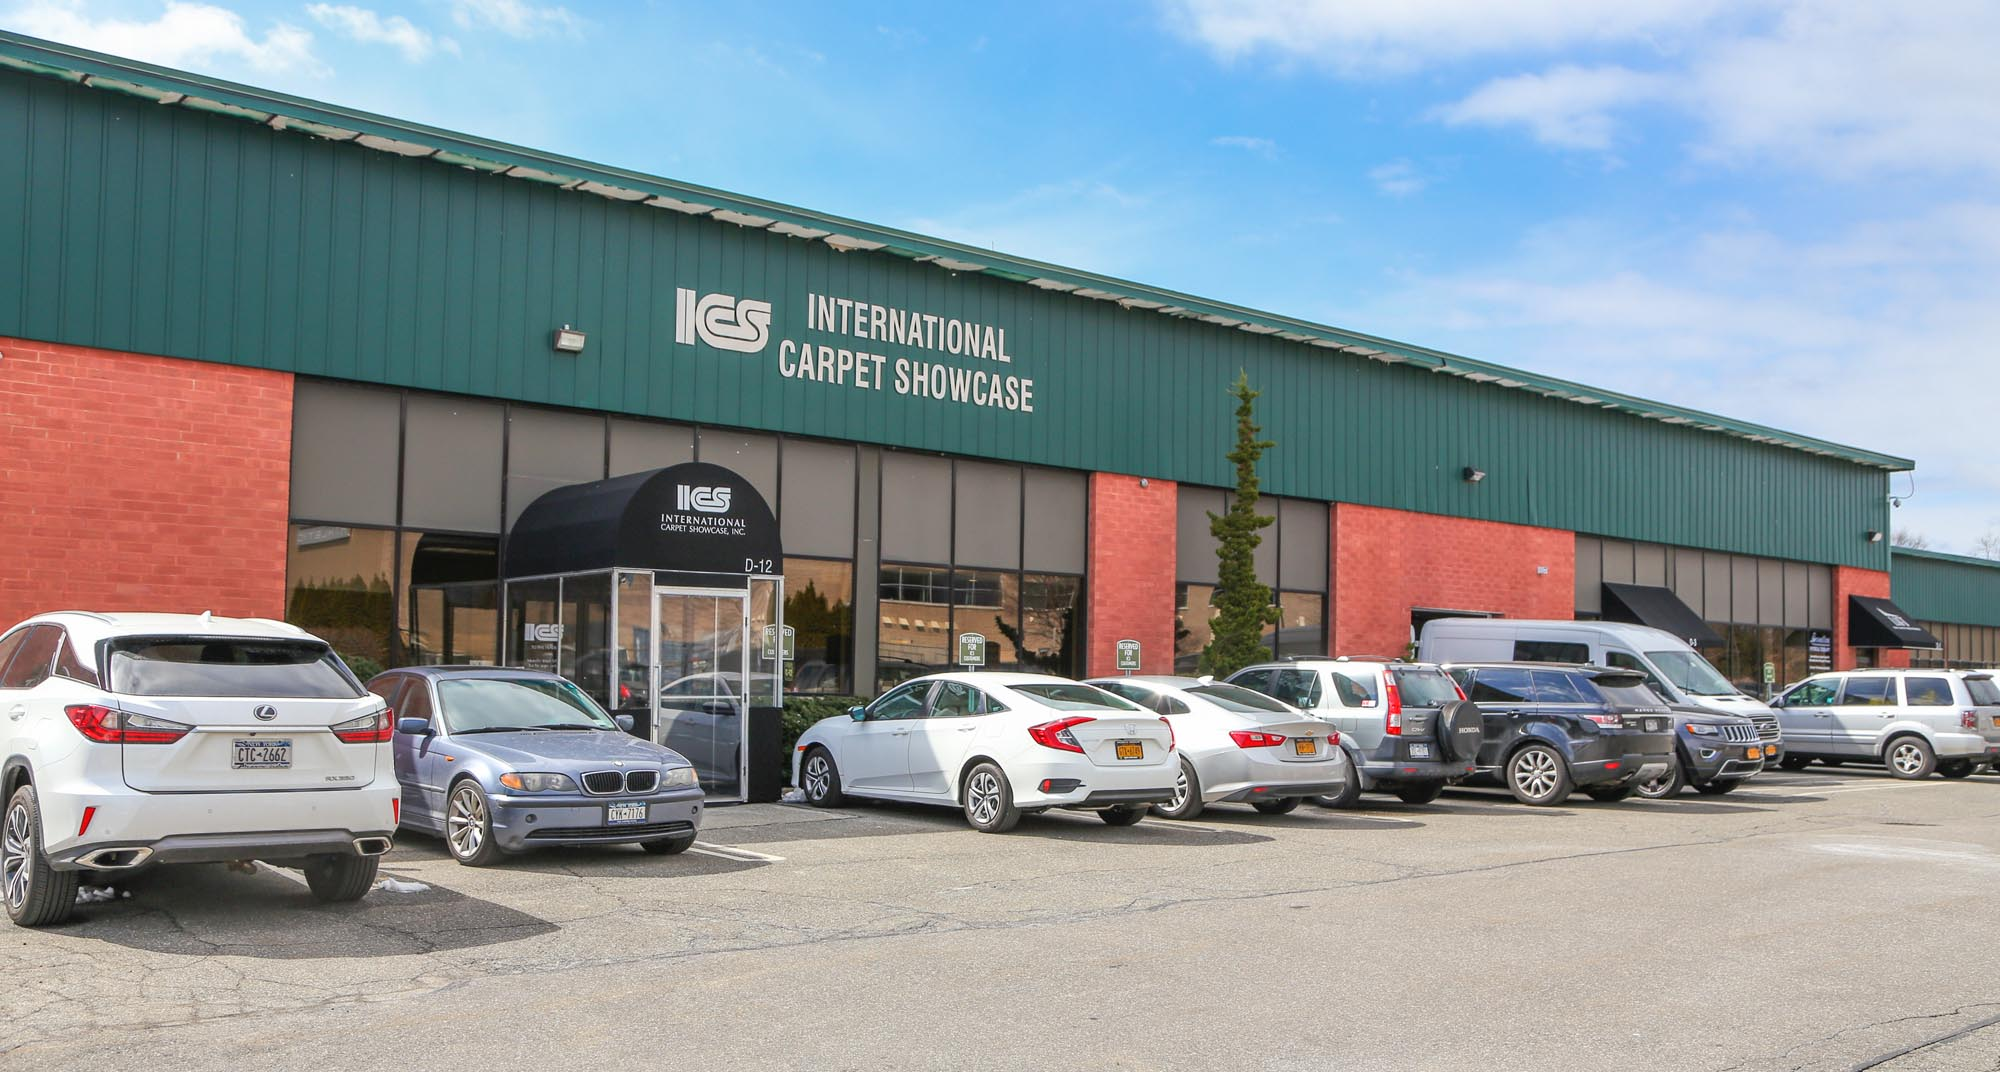 Building front of International Carpet Showcase